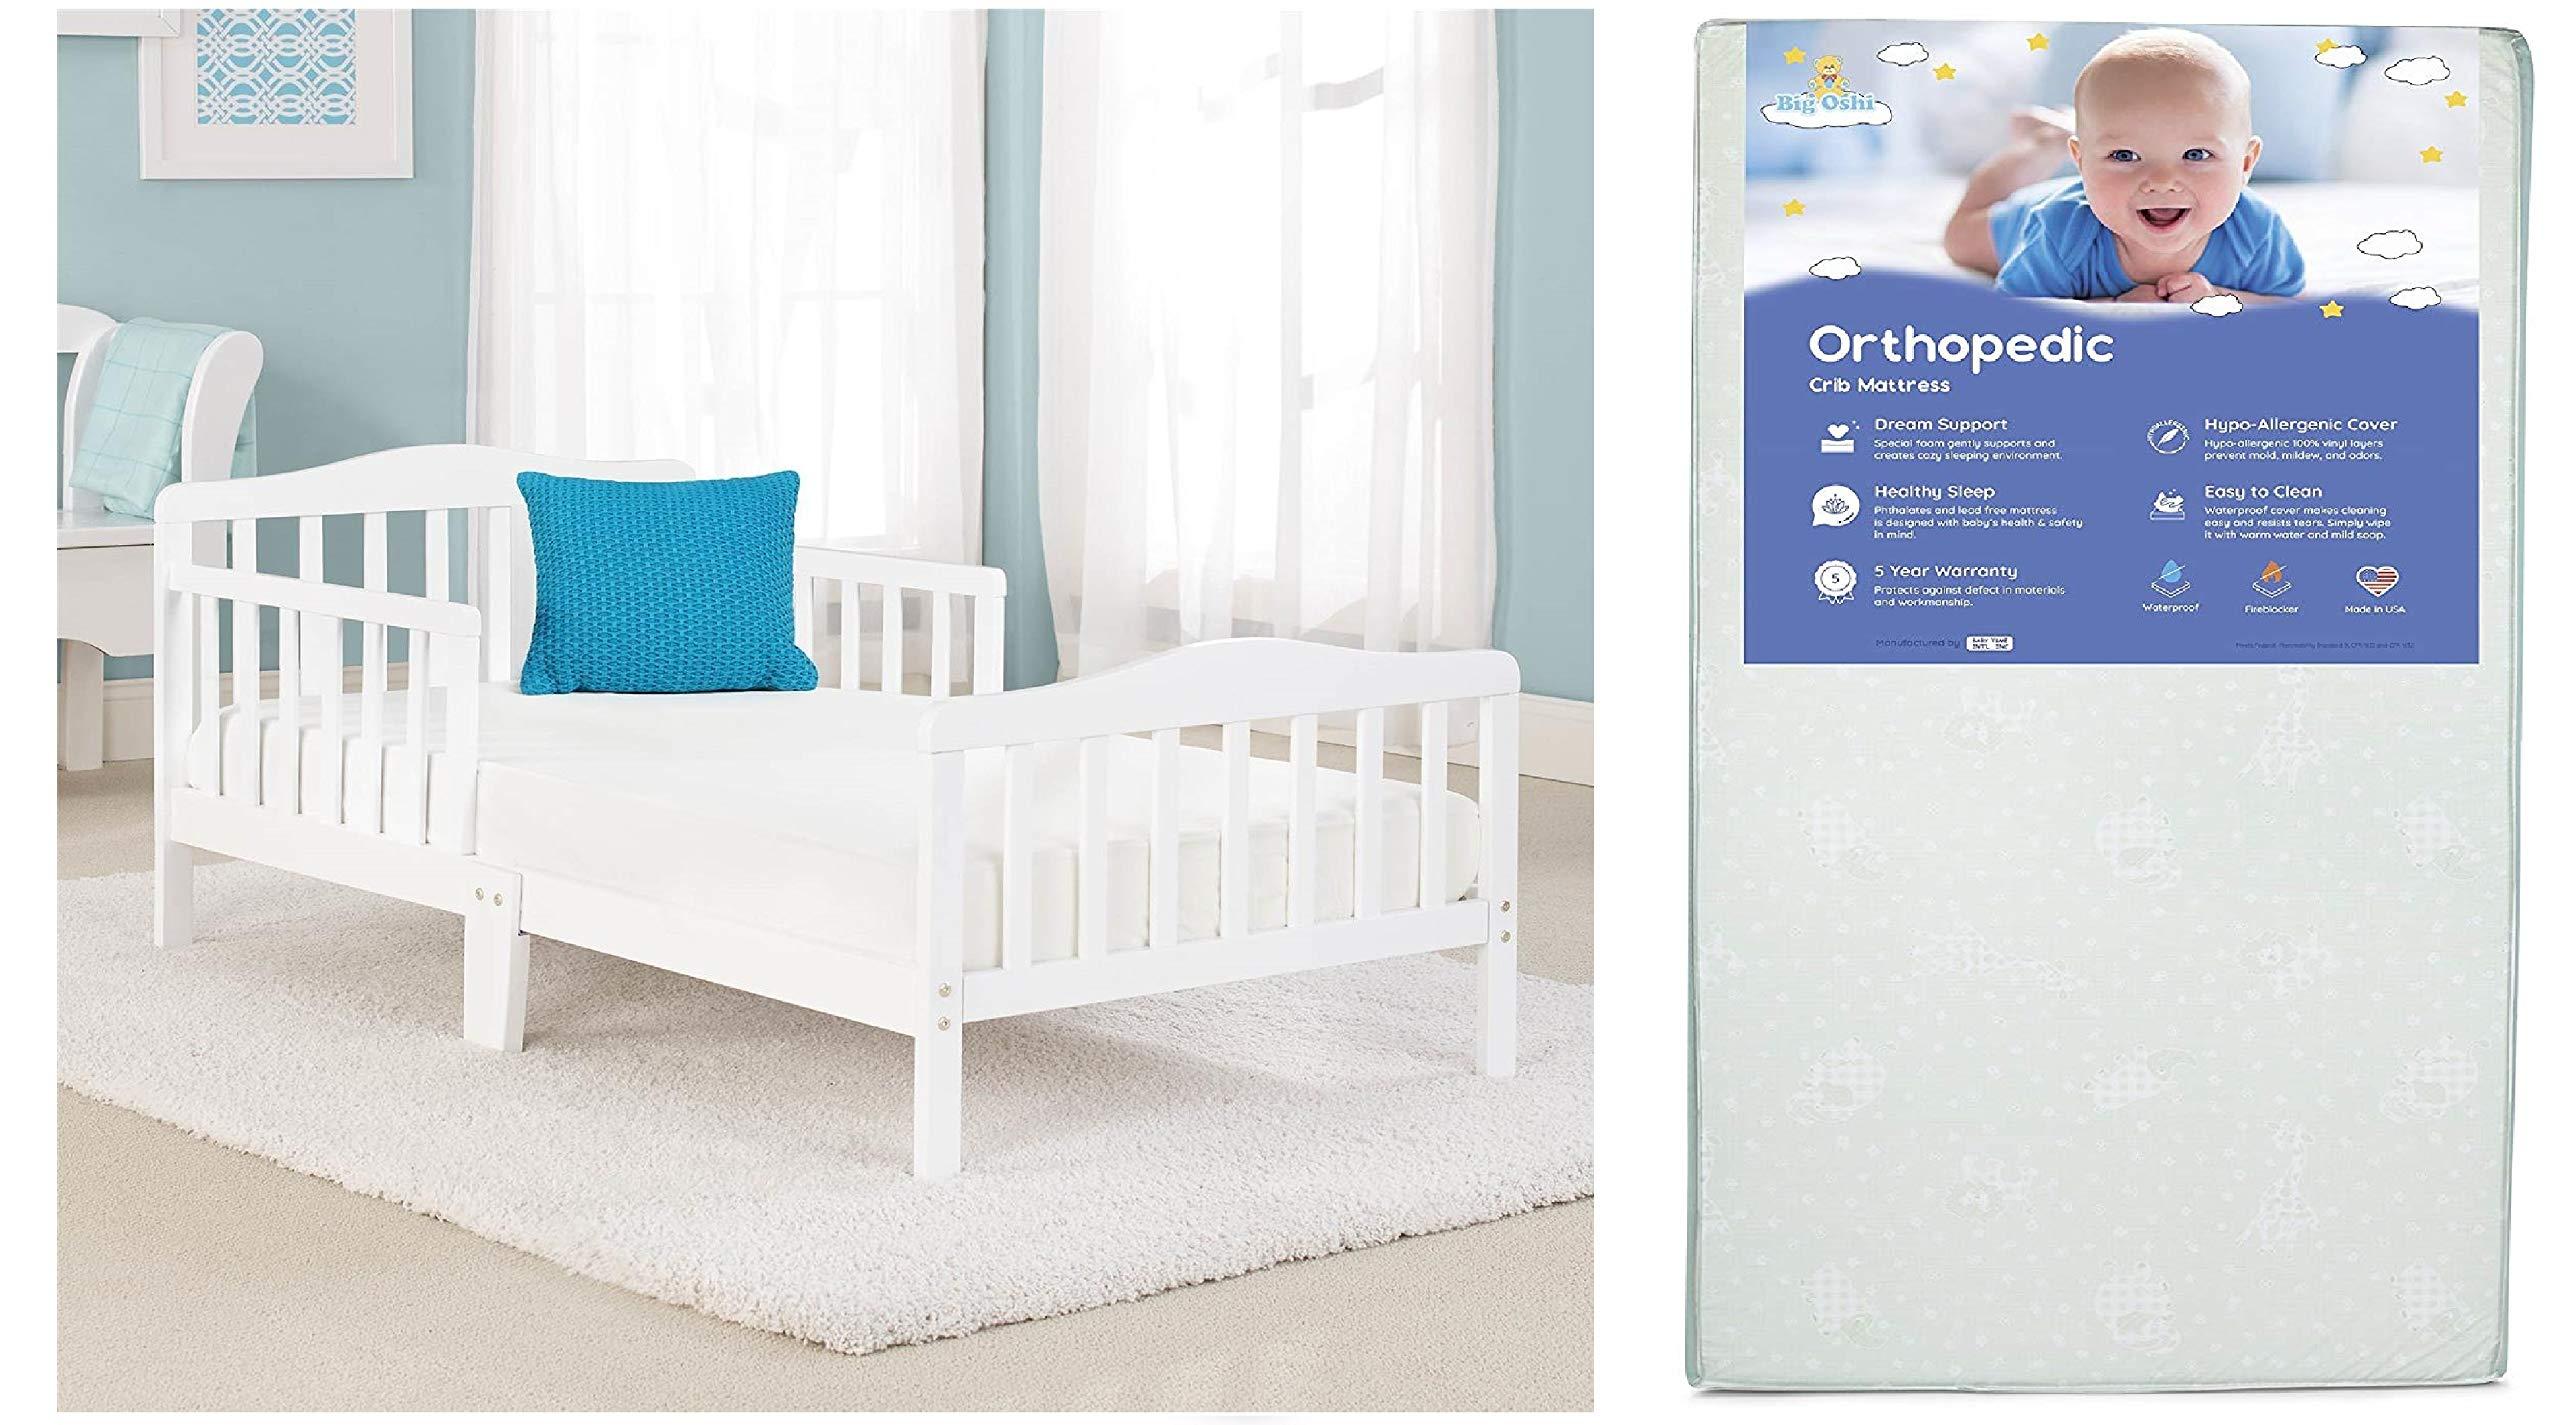 Big Oshi Contemporary Toddler Bed & Mattress Bundle, Waterproof, Non-Toxic Mattress, White Bed Bundle